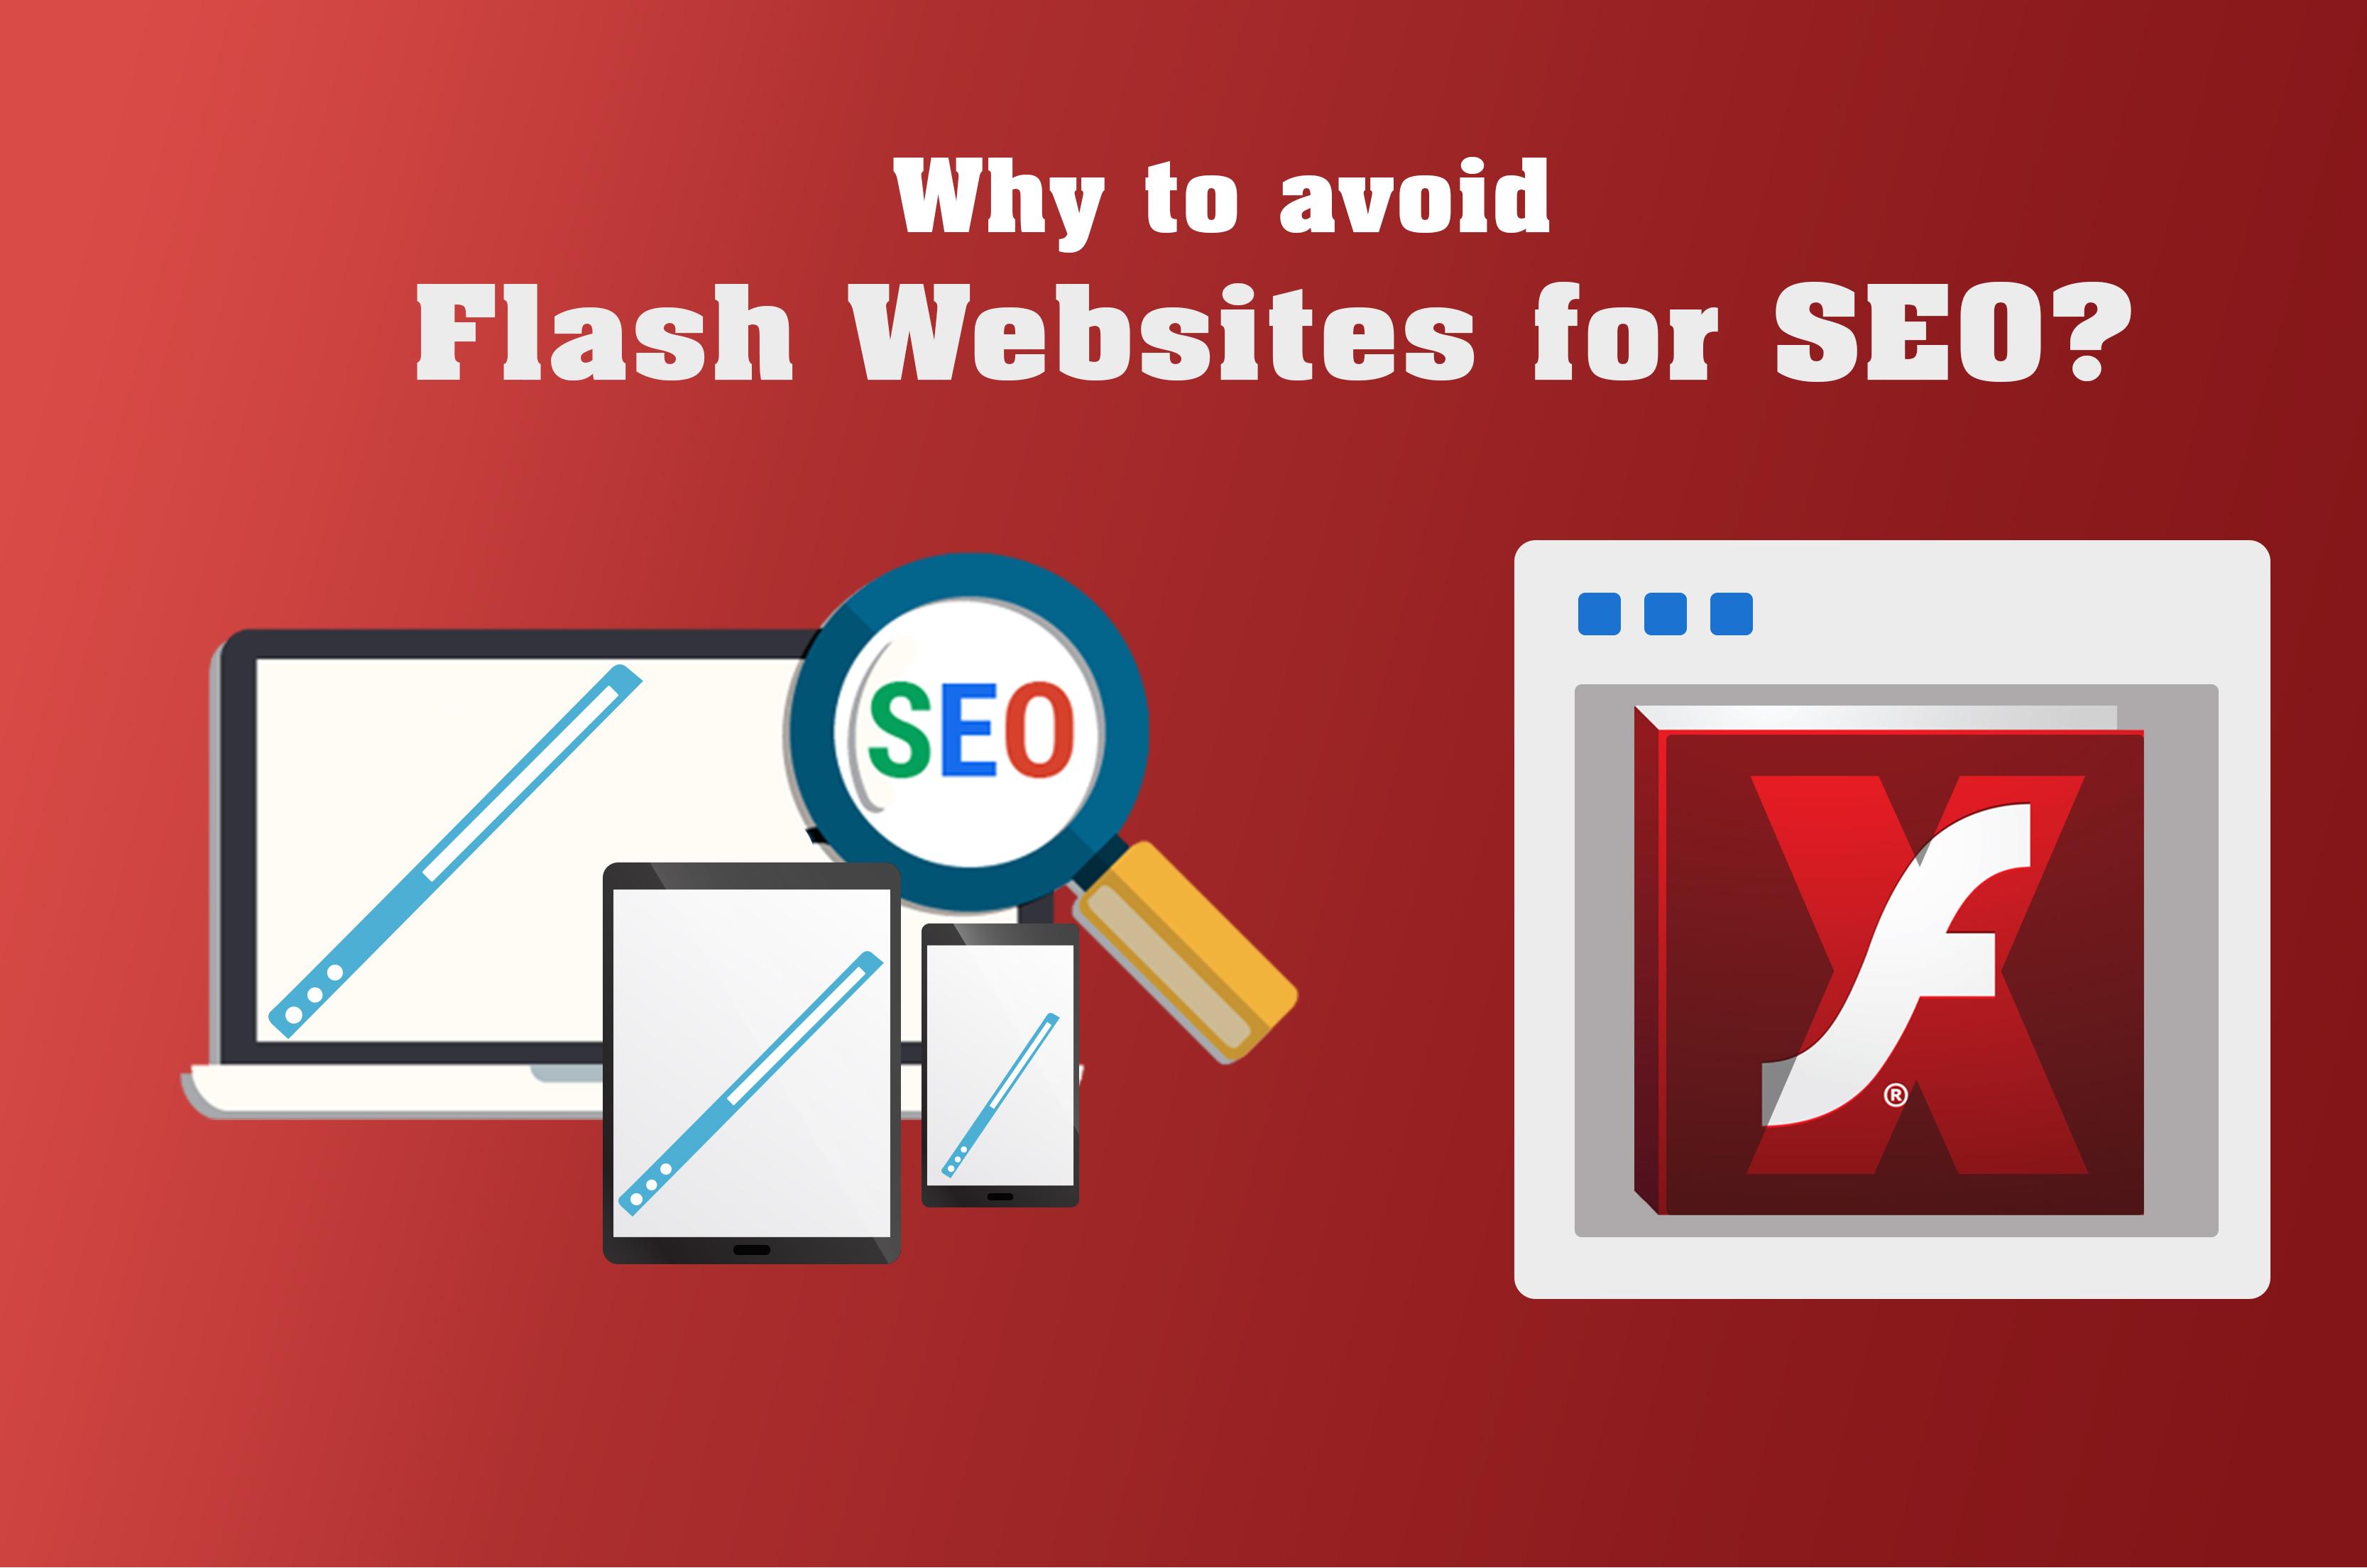 Flash Websites for SEO